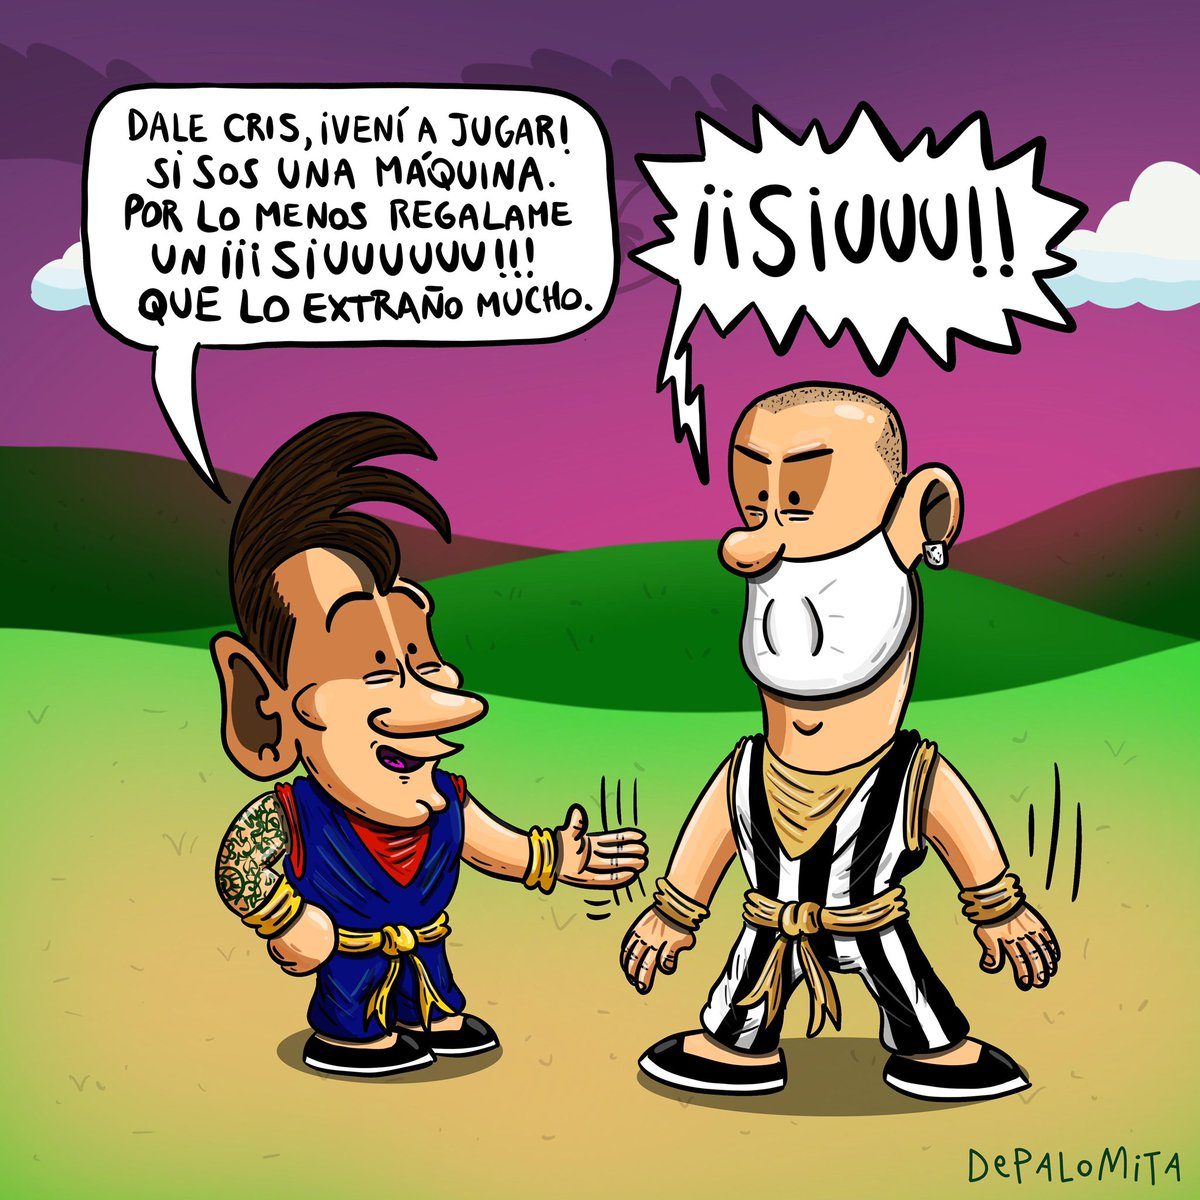 La Pulga extraña jugar contra Cris. 🐉🟠  #eldiariodelapulga #leomessi #cristiano #fcbarcelona #juventus #champions #cr7 #messi #dragonball #cartoon #caricatura #humor #depalomita https://t.co/gsyRYOZ572